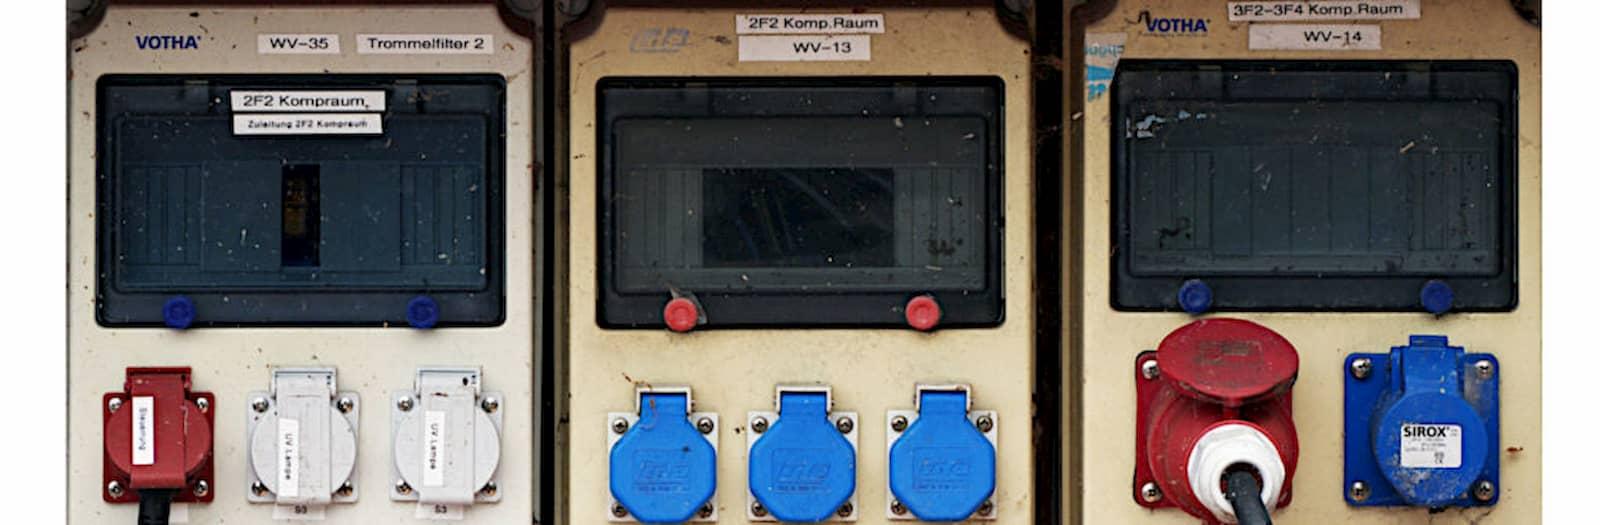 Sicurezza Elettrica nei Cantieri